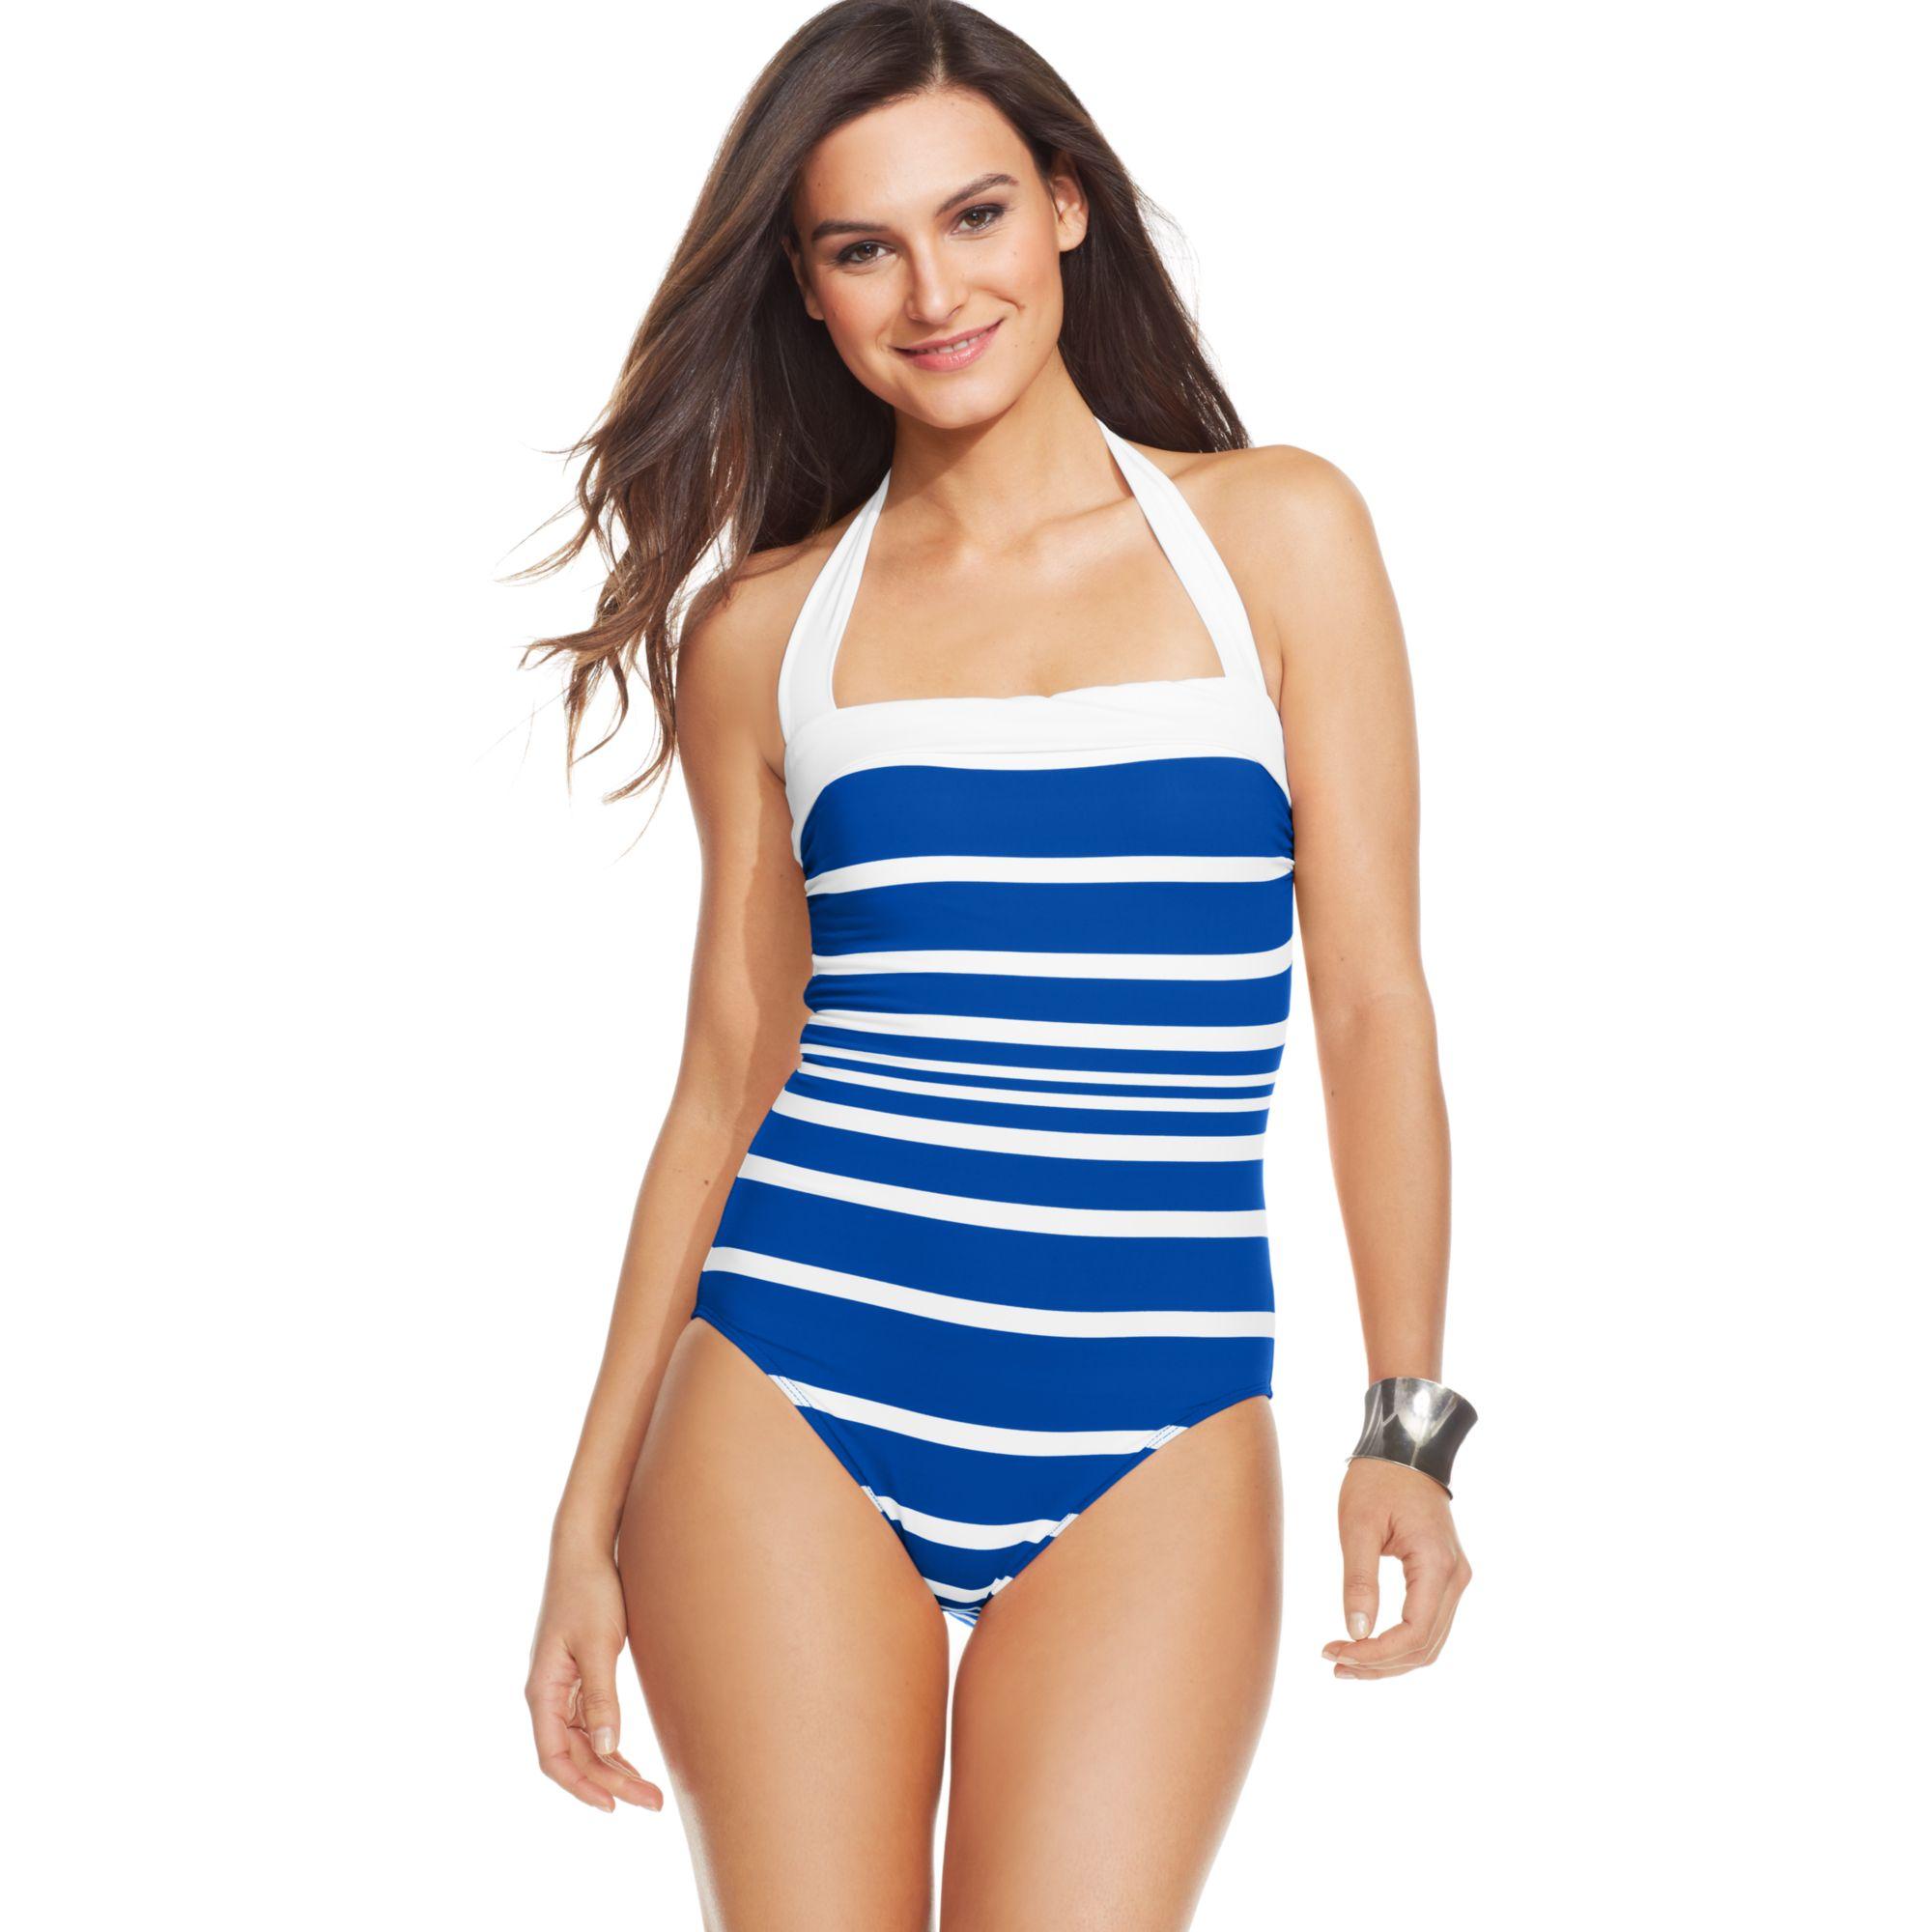 6cea34c721 ralph lauren swimming costumes